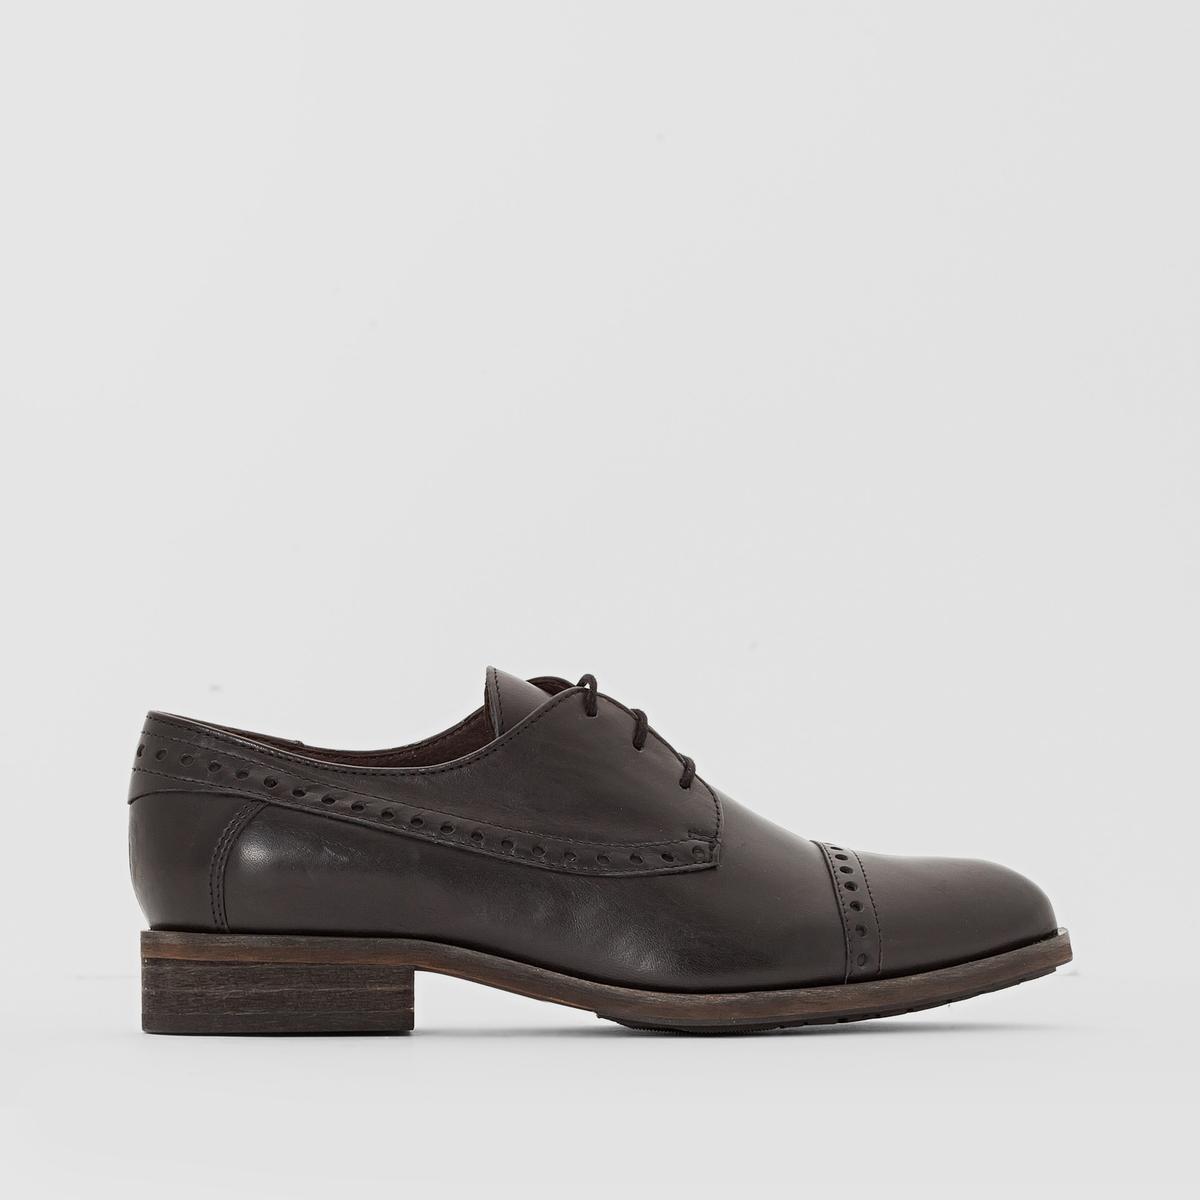 Ботинки-дерби кожаные Sally